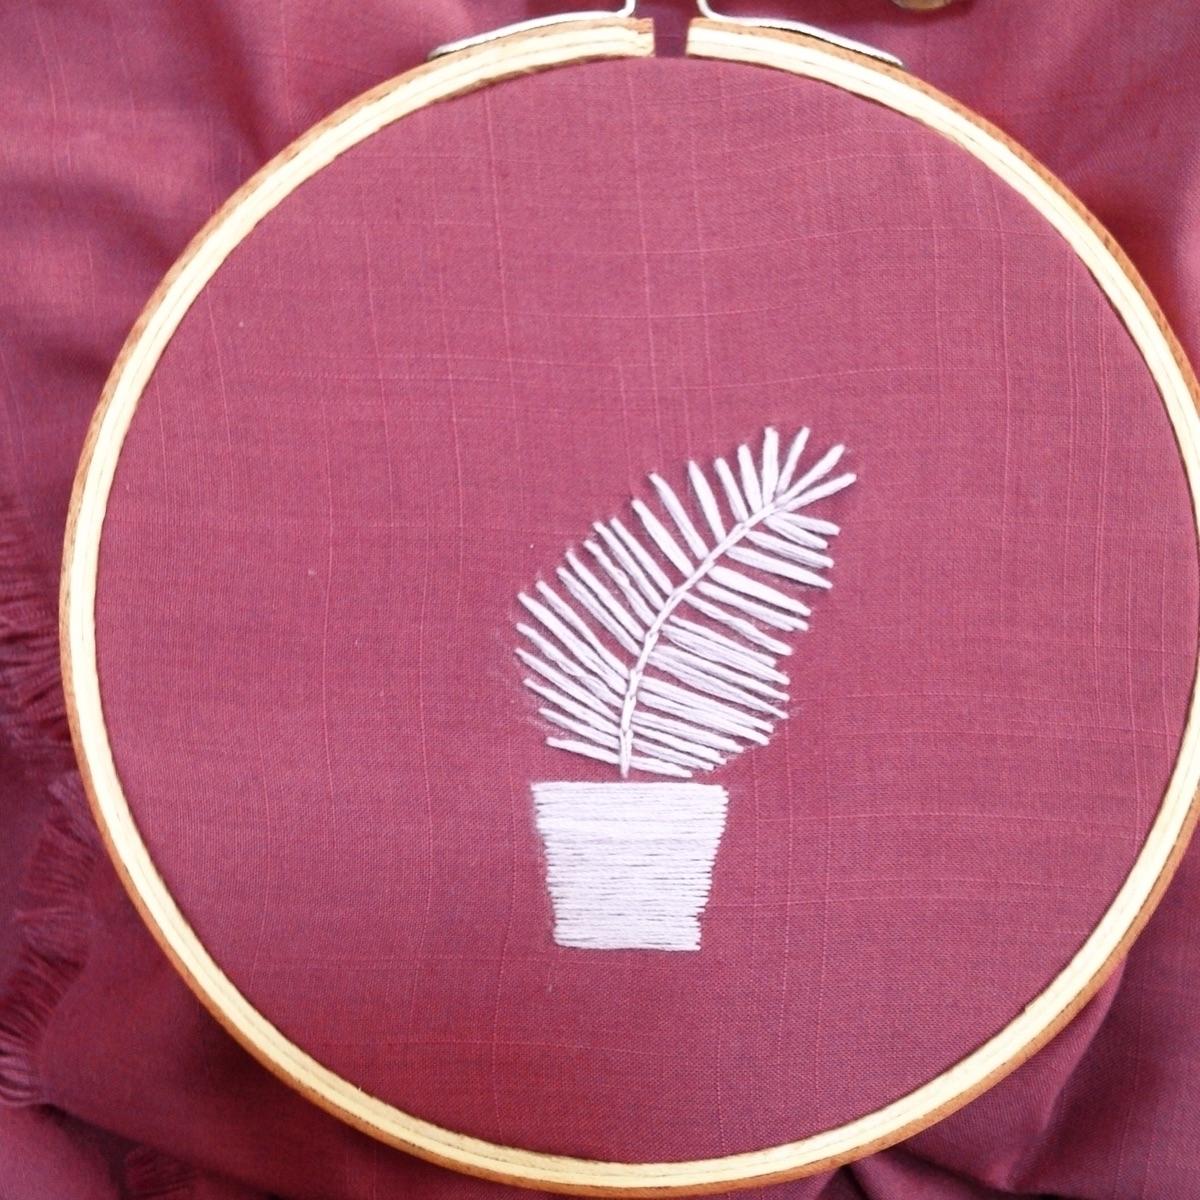 week single color bad guess - embroidery - whoisluksi | ello